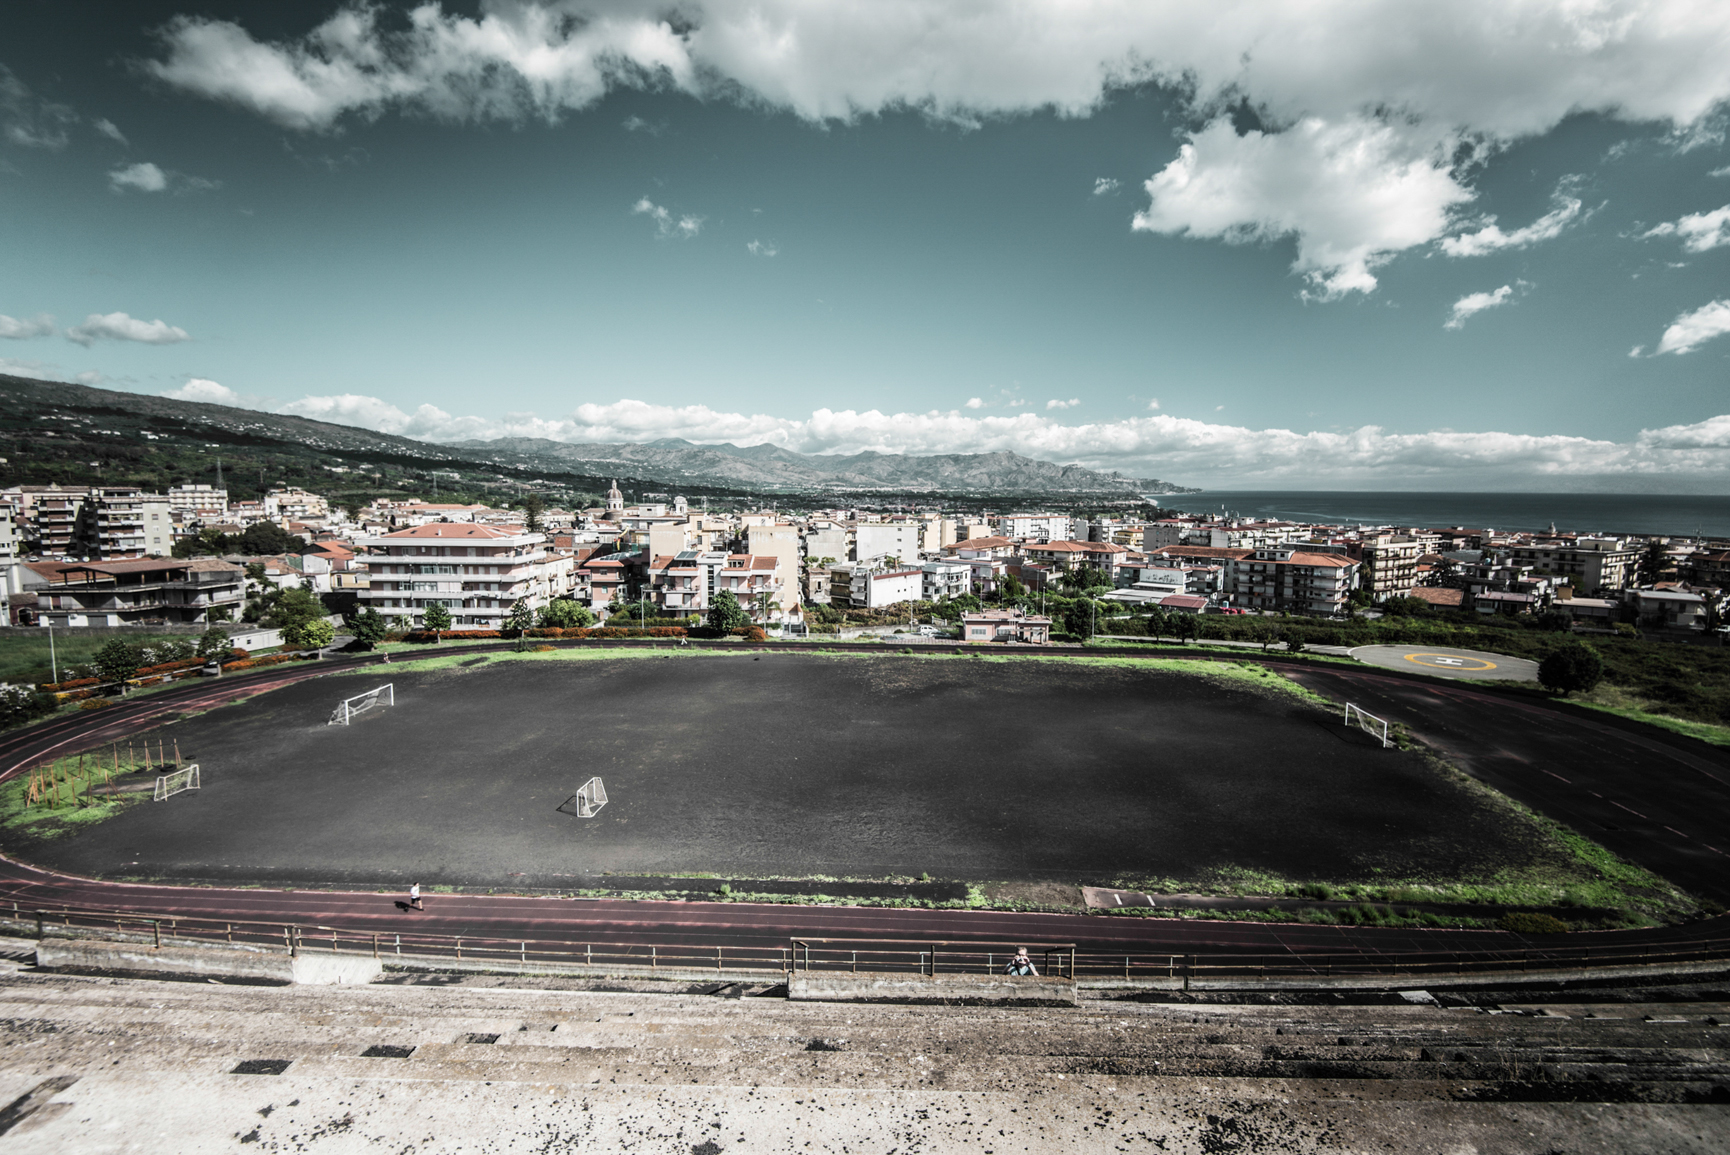 giarre pista d'atletica 3 (16).jpg